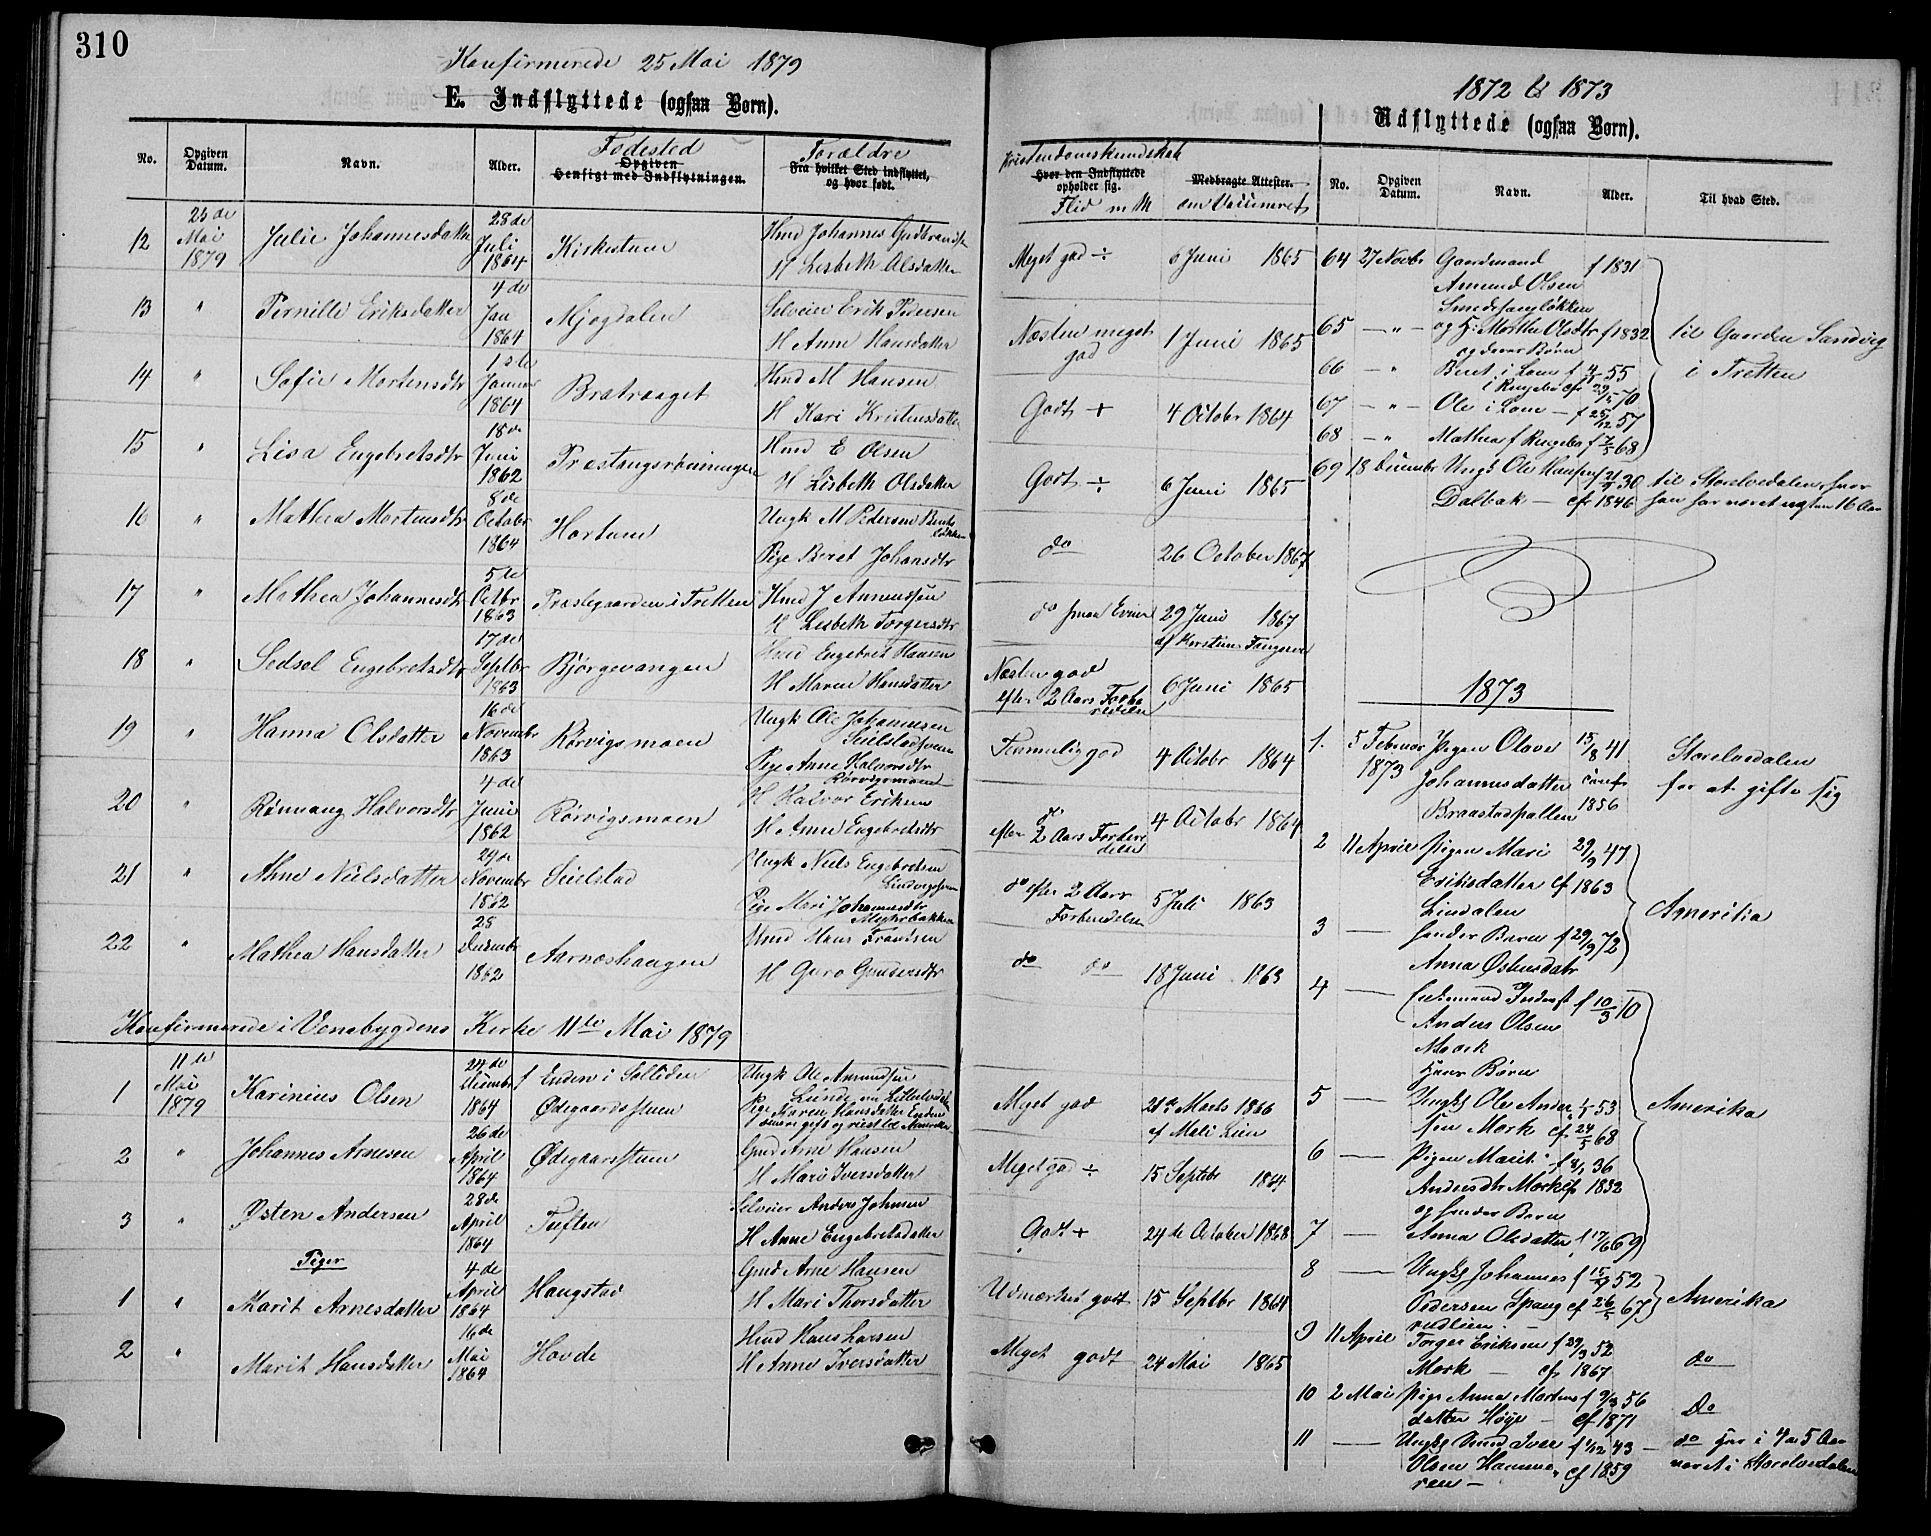 SAH, Ringebu prestekontor, Klokkerbok nr. 4, 1867-1879, s. 310